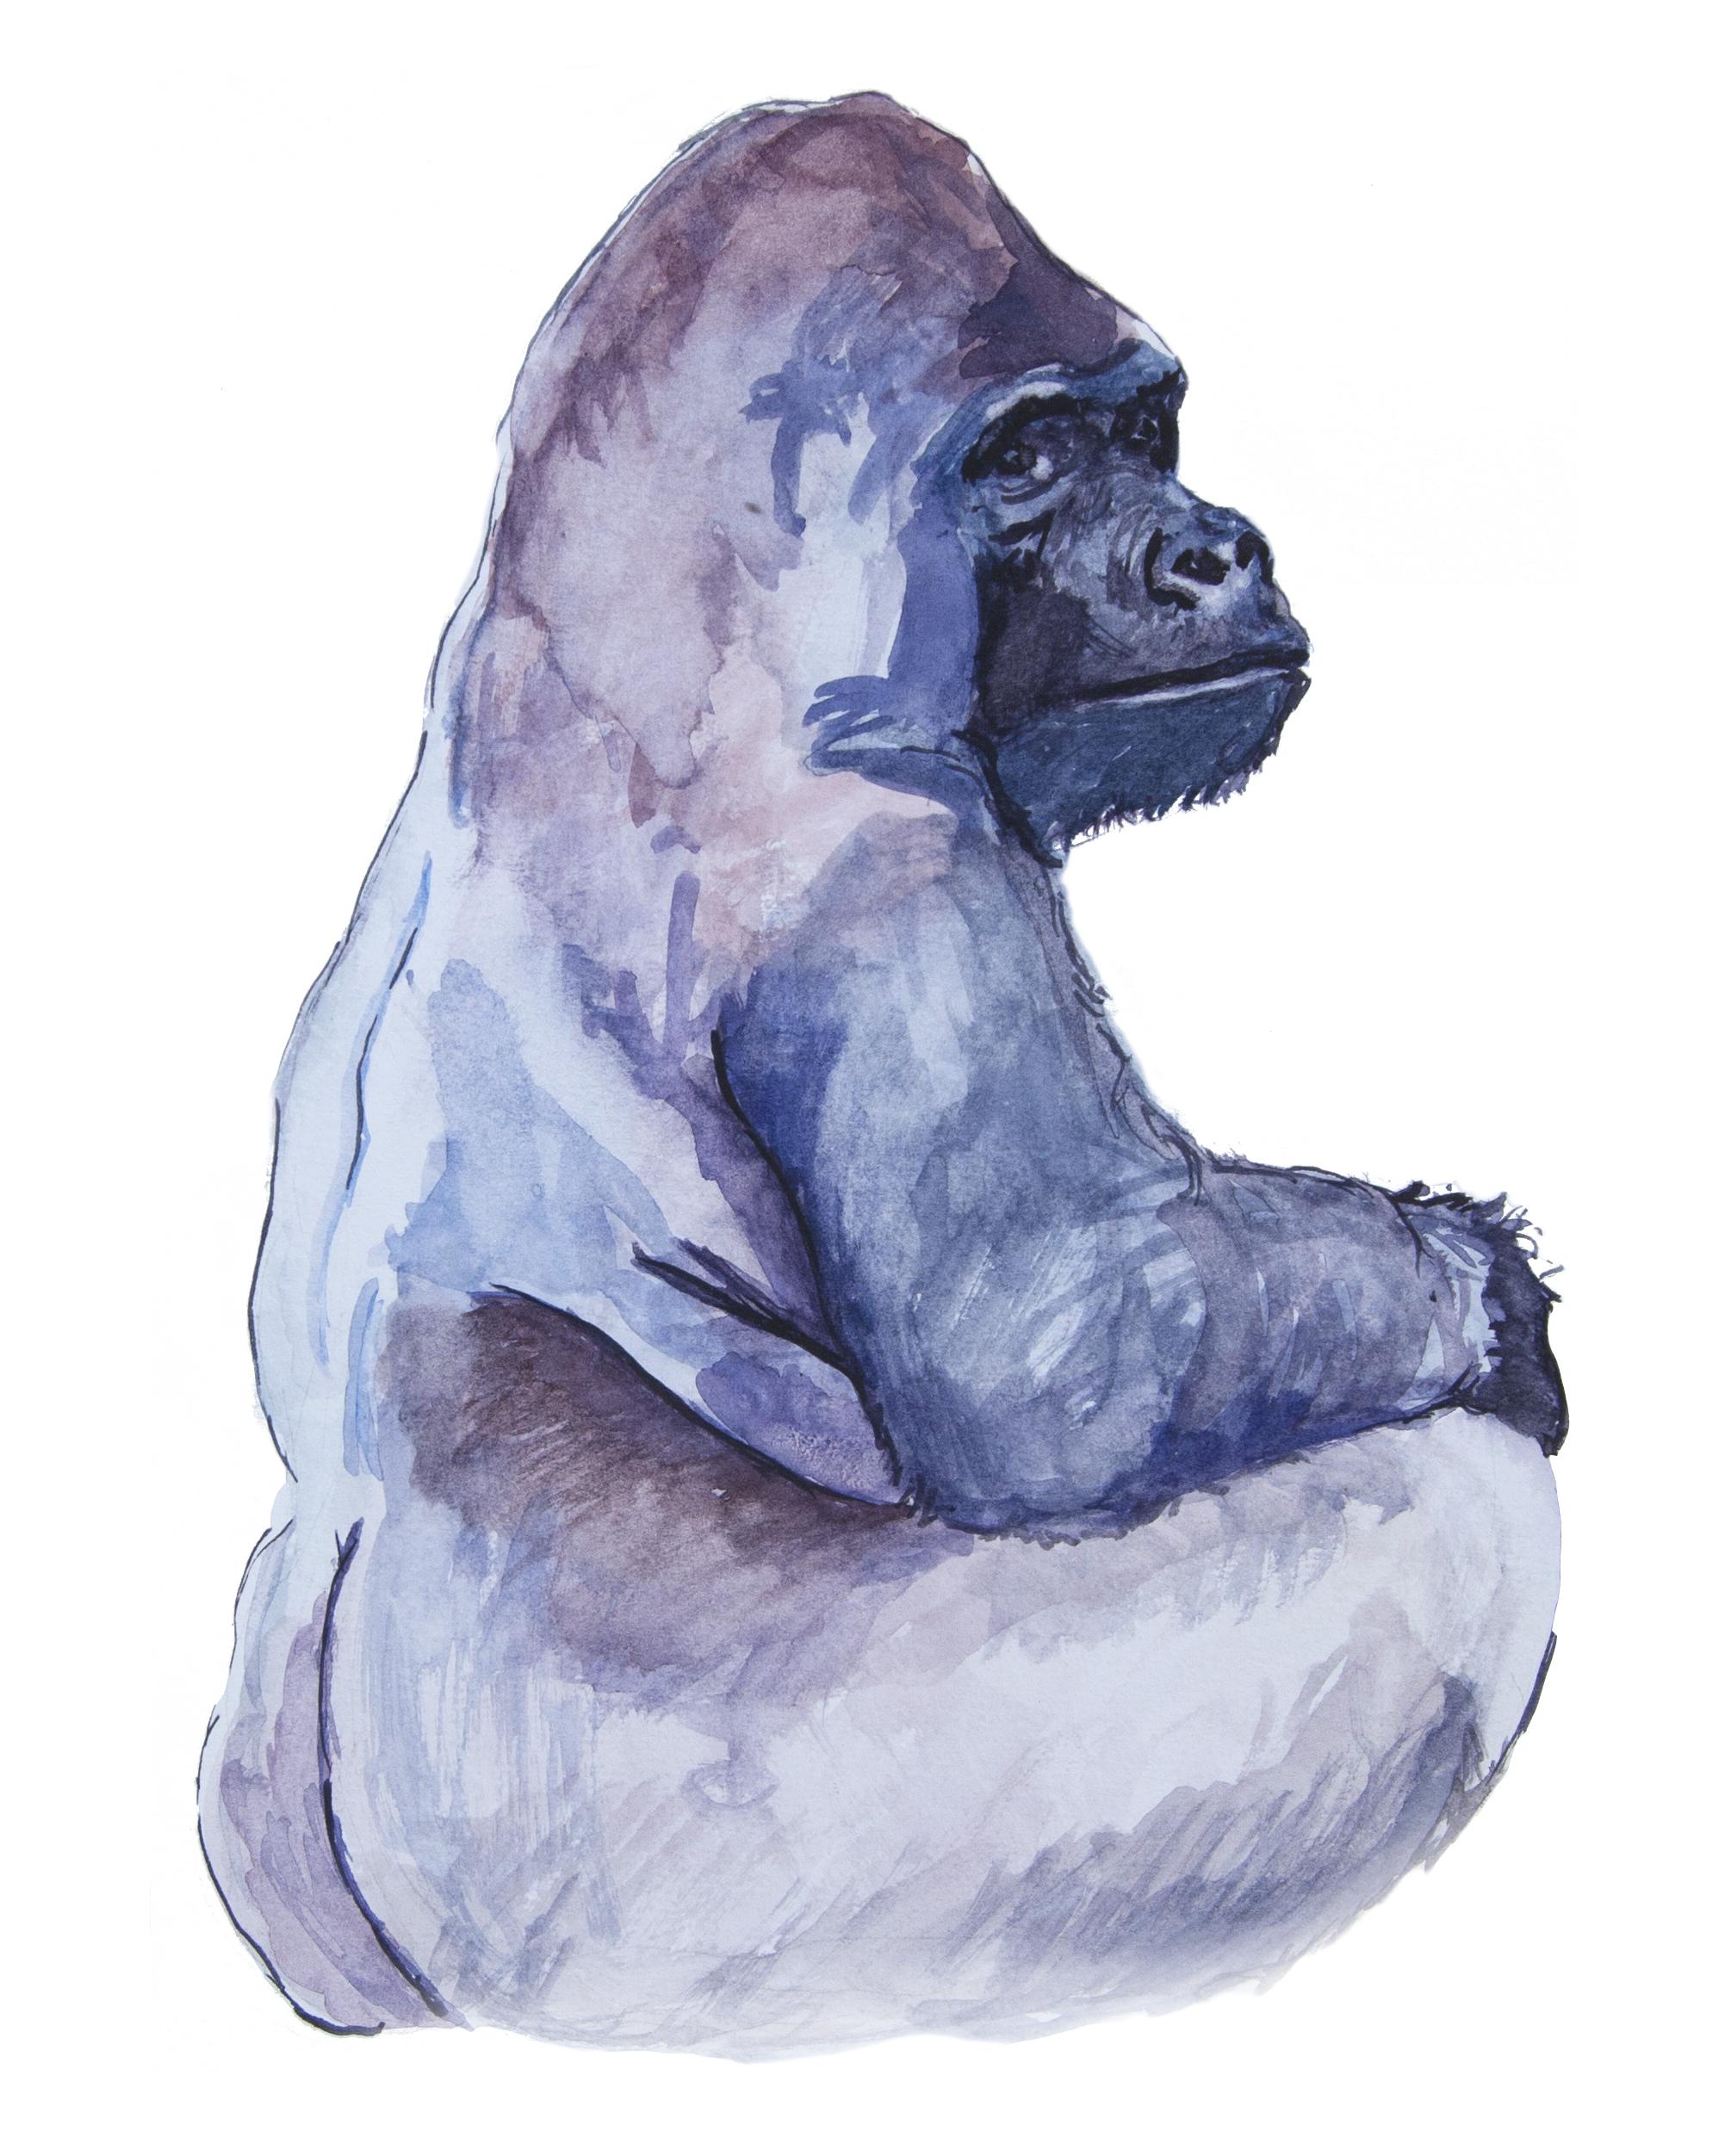 gorilla watercolor. meredith nutting 2017